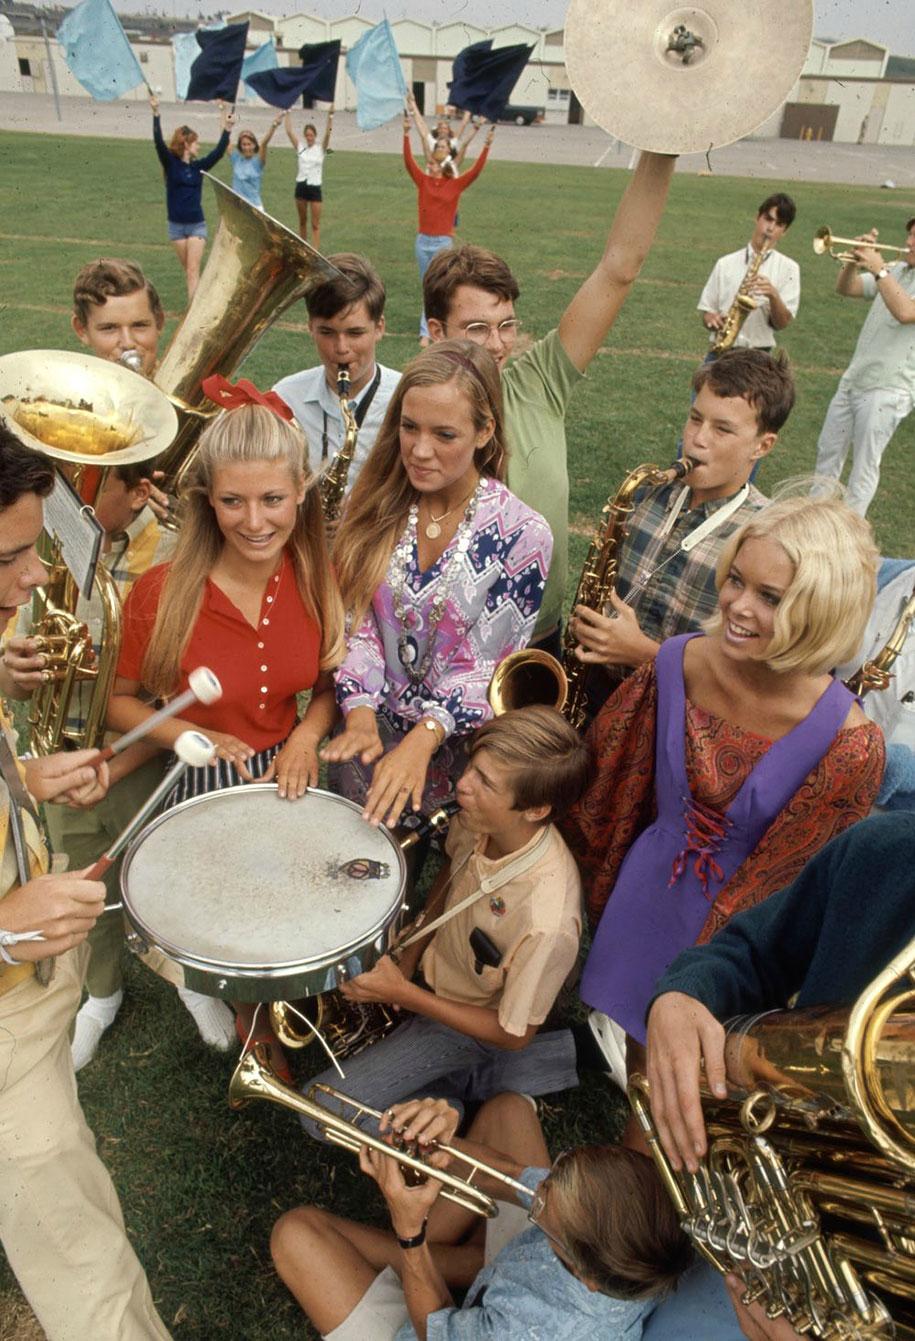 1969-hippie-high-school-counterculture-photography-2